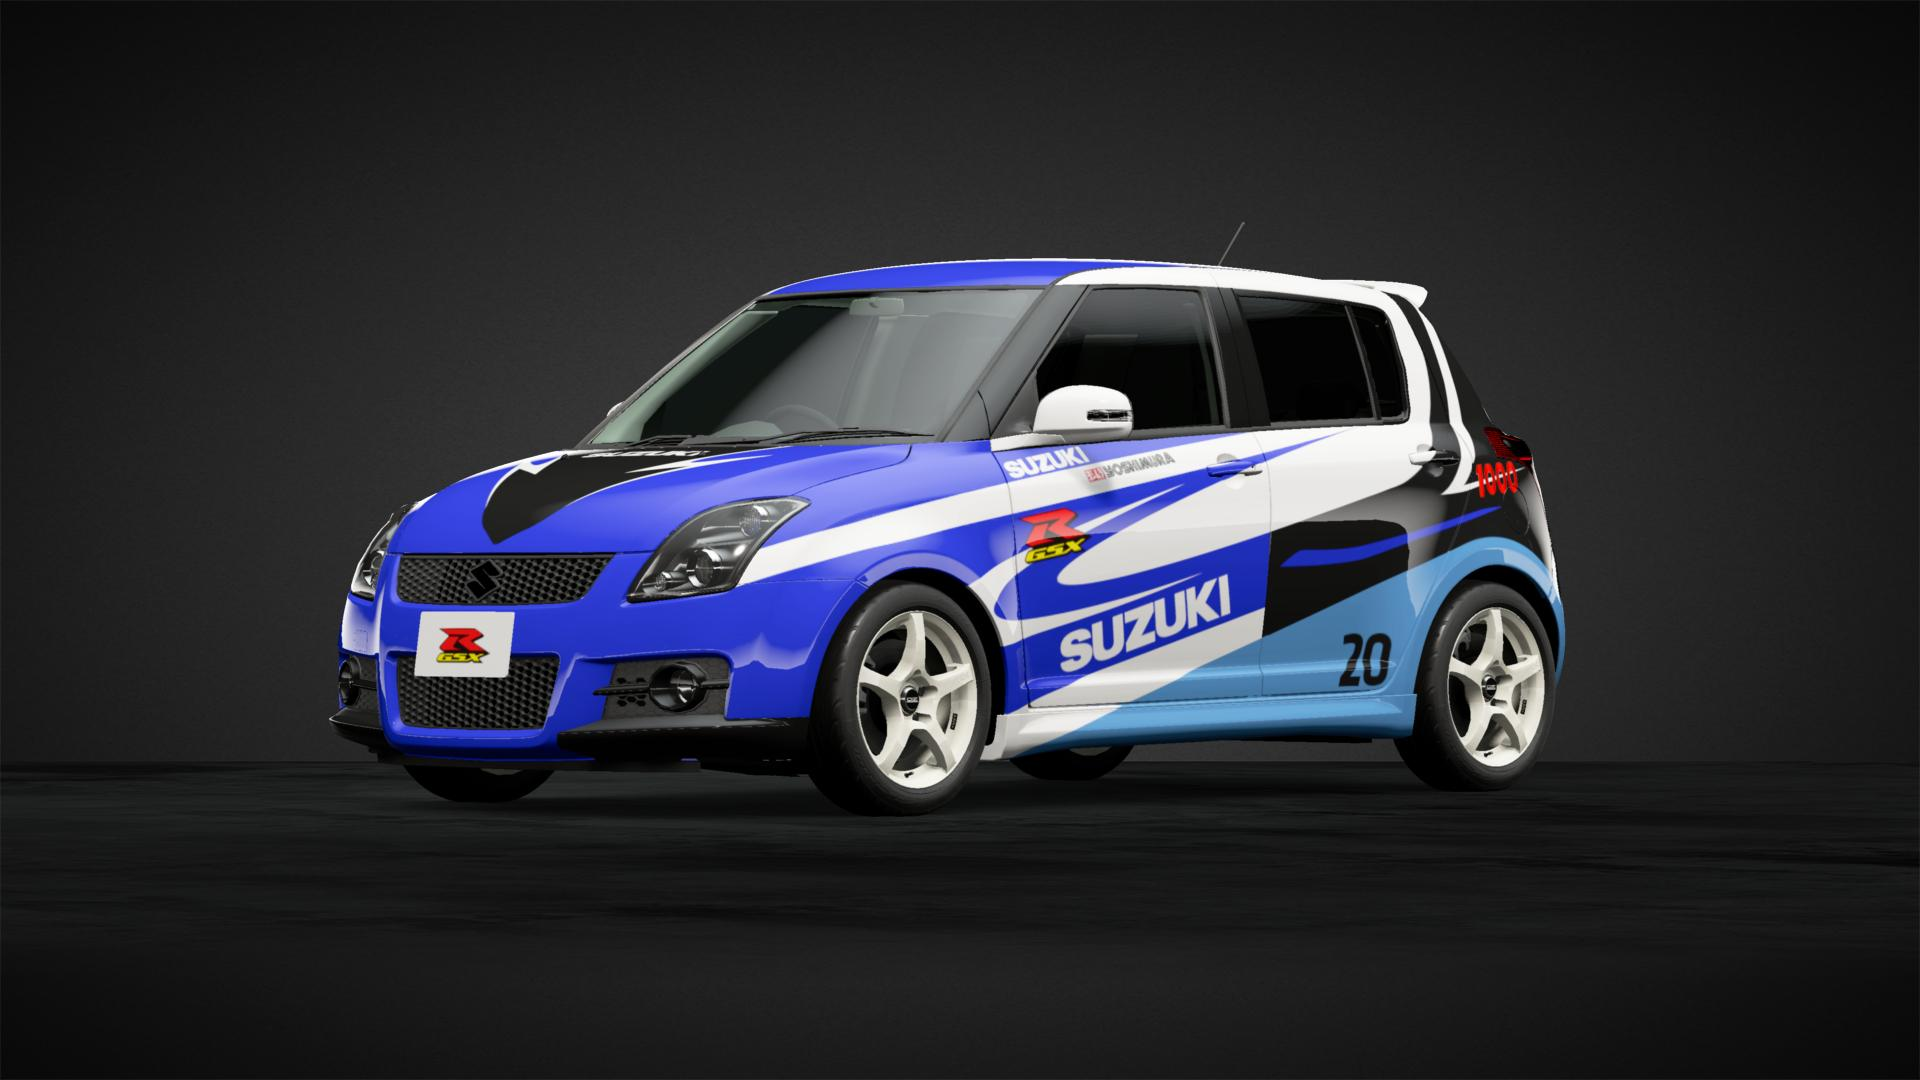 hight resolution of suzuki gsx r 1000 2001 2002 car livery by kimikaf1 community gran turismo sport